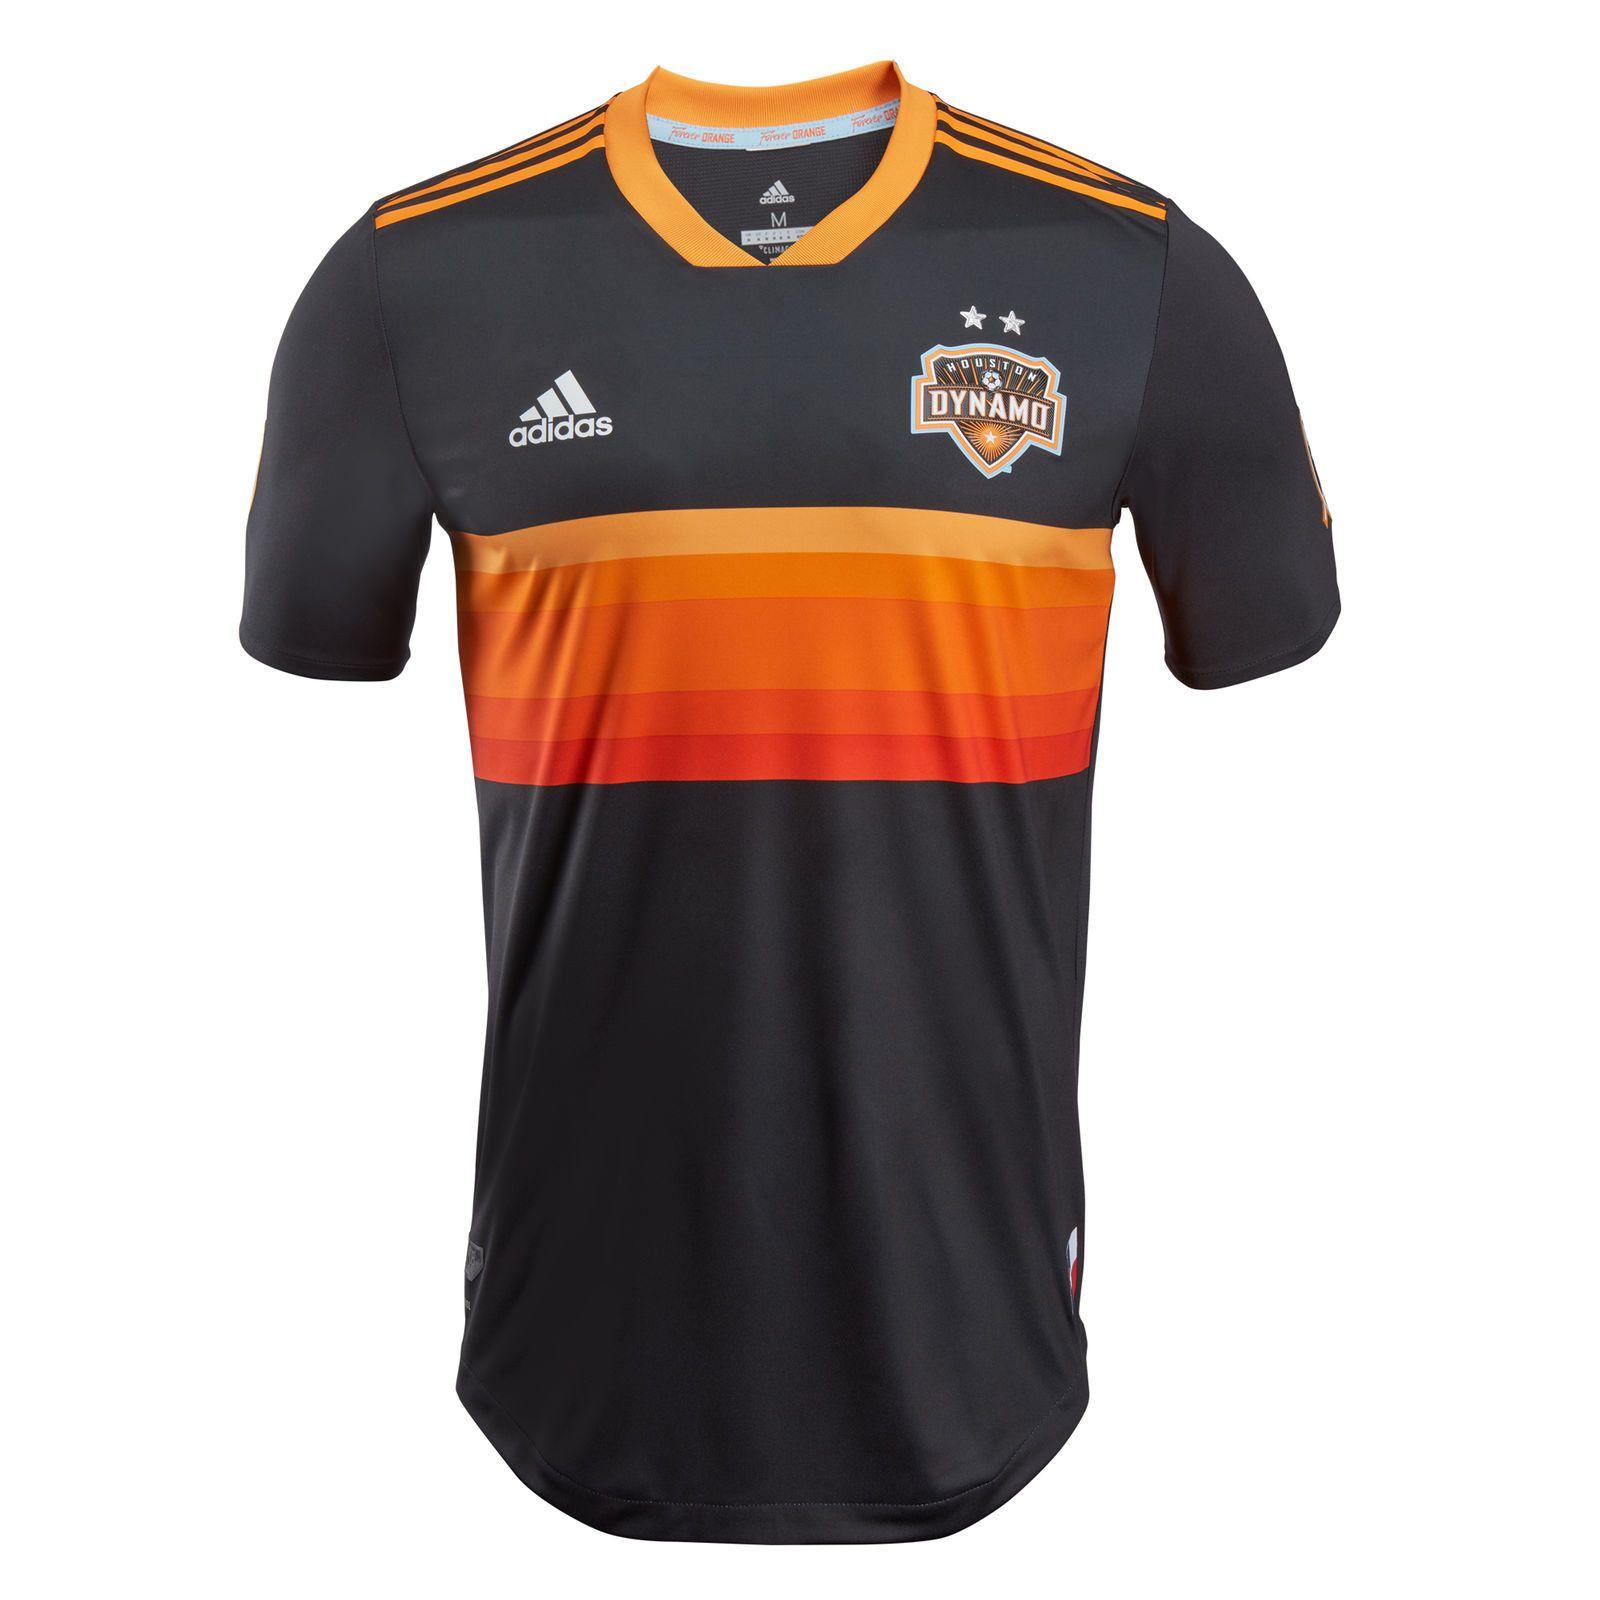 Houston Dynamo 2018 Adidas Away Kit   17/18 Kits   Football shirt ...